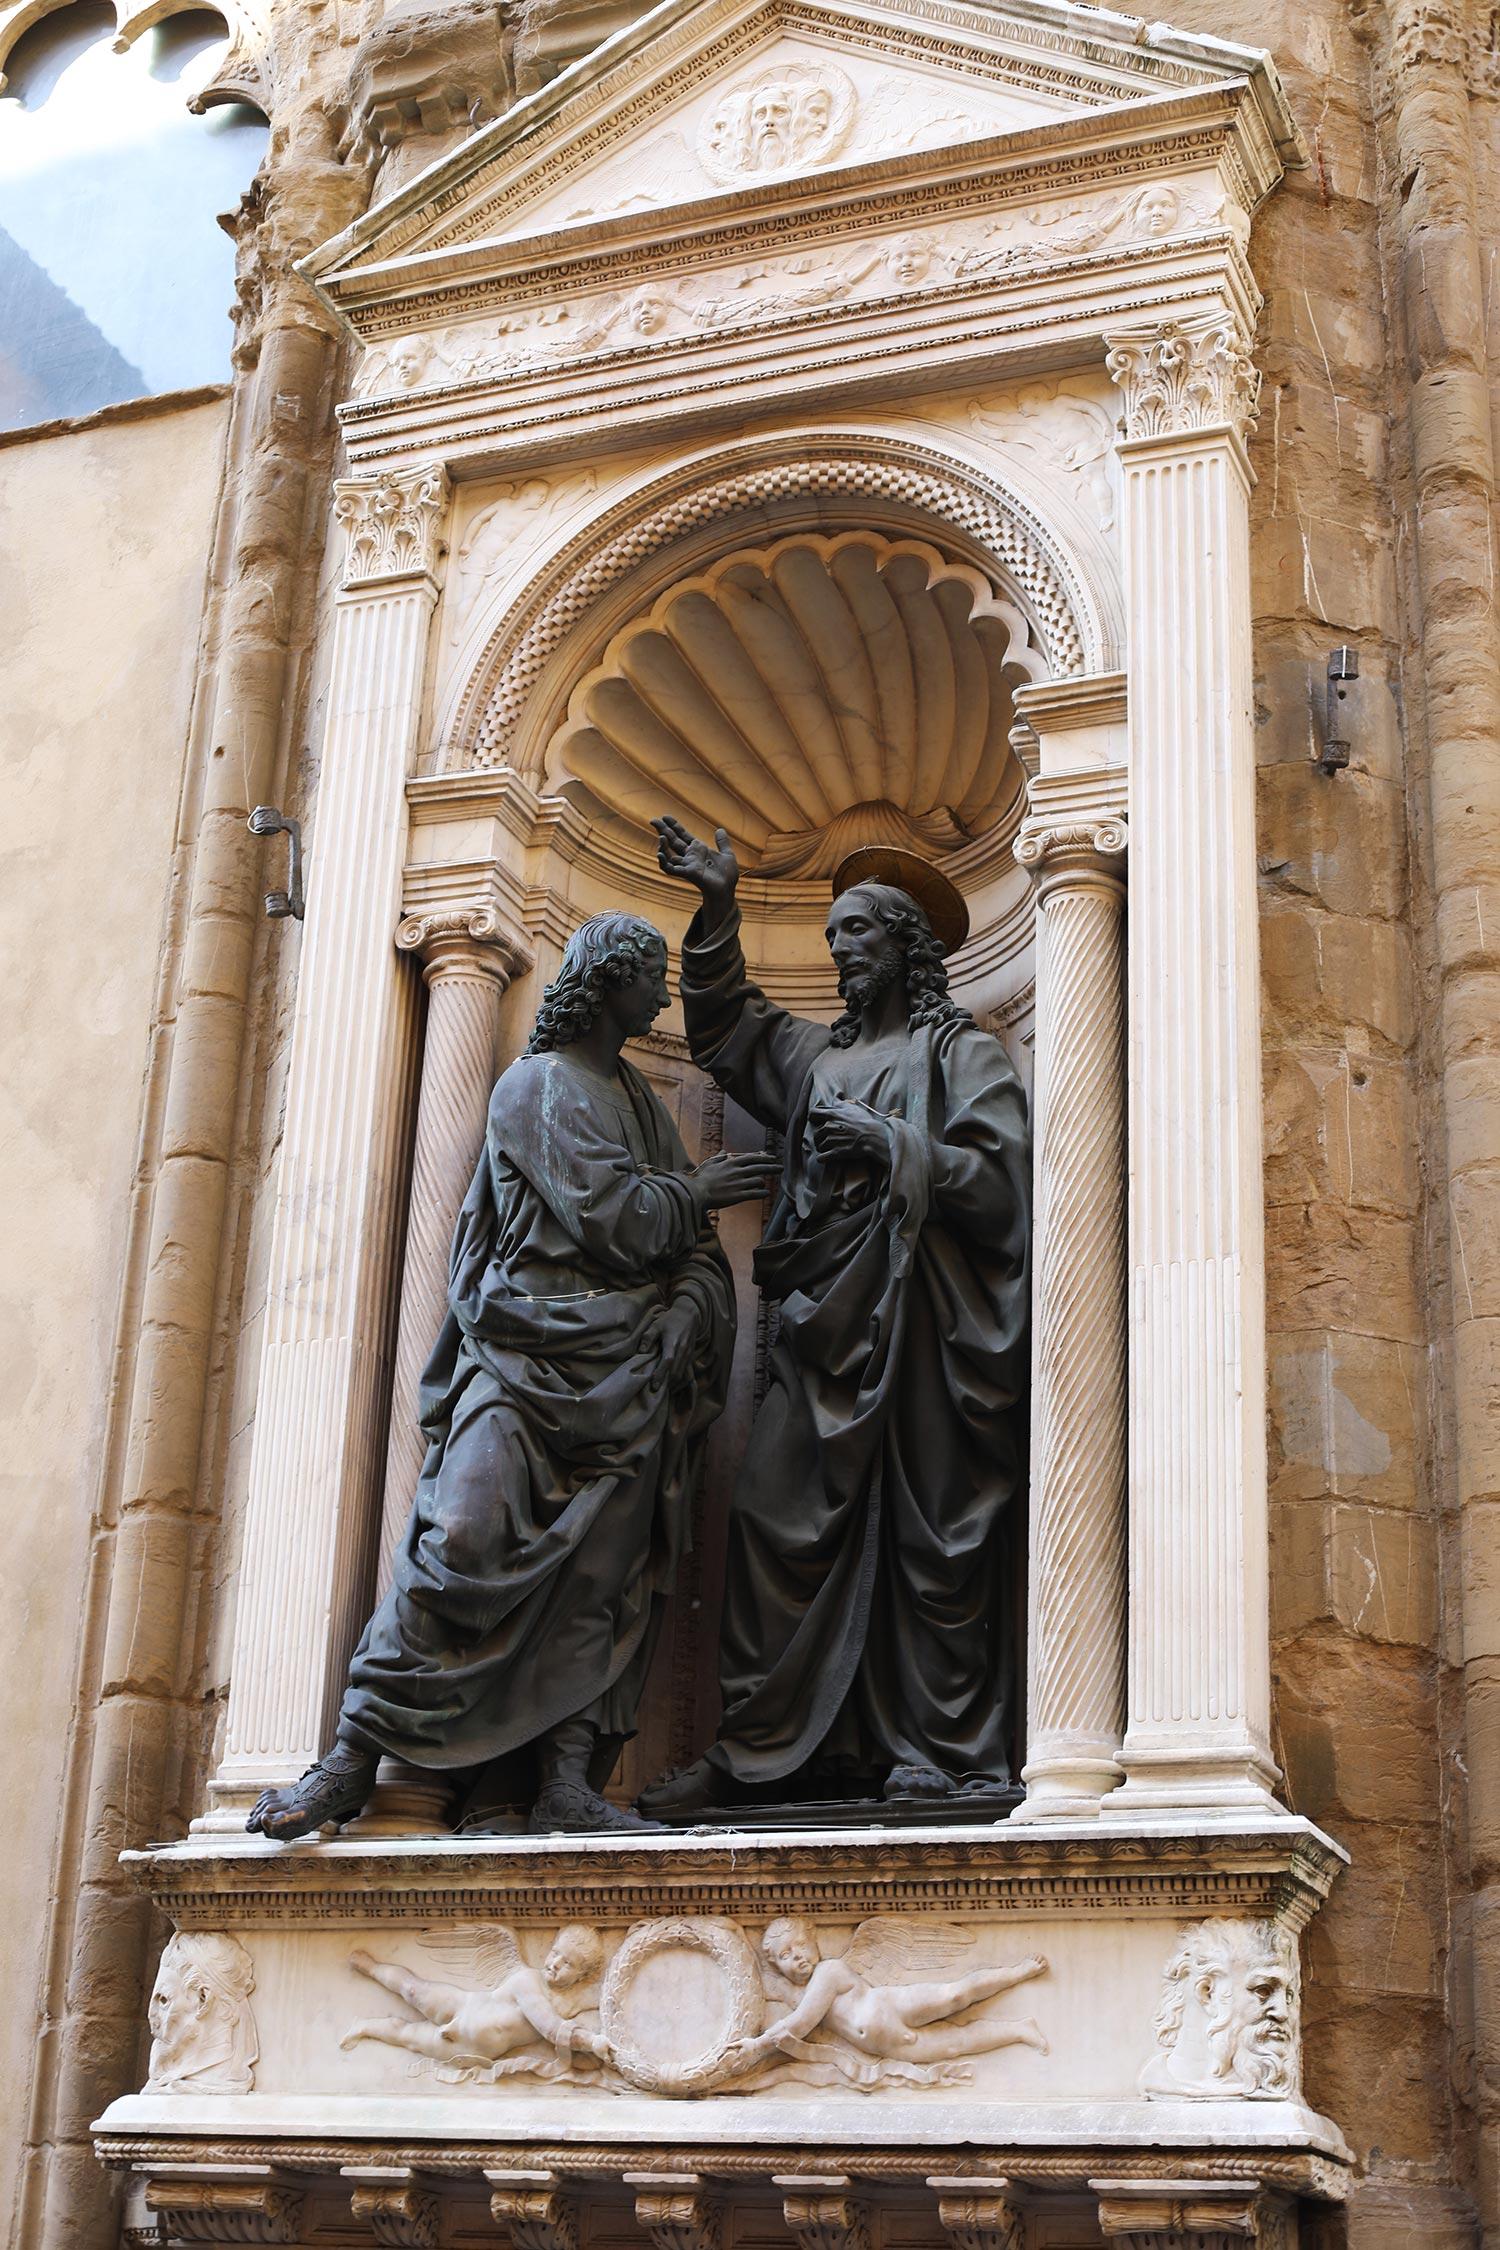 Pilgrimage_Rome_4377_Florence.jpg